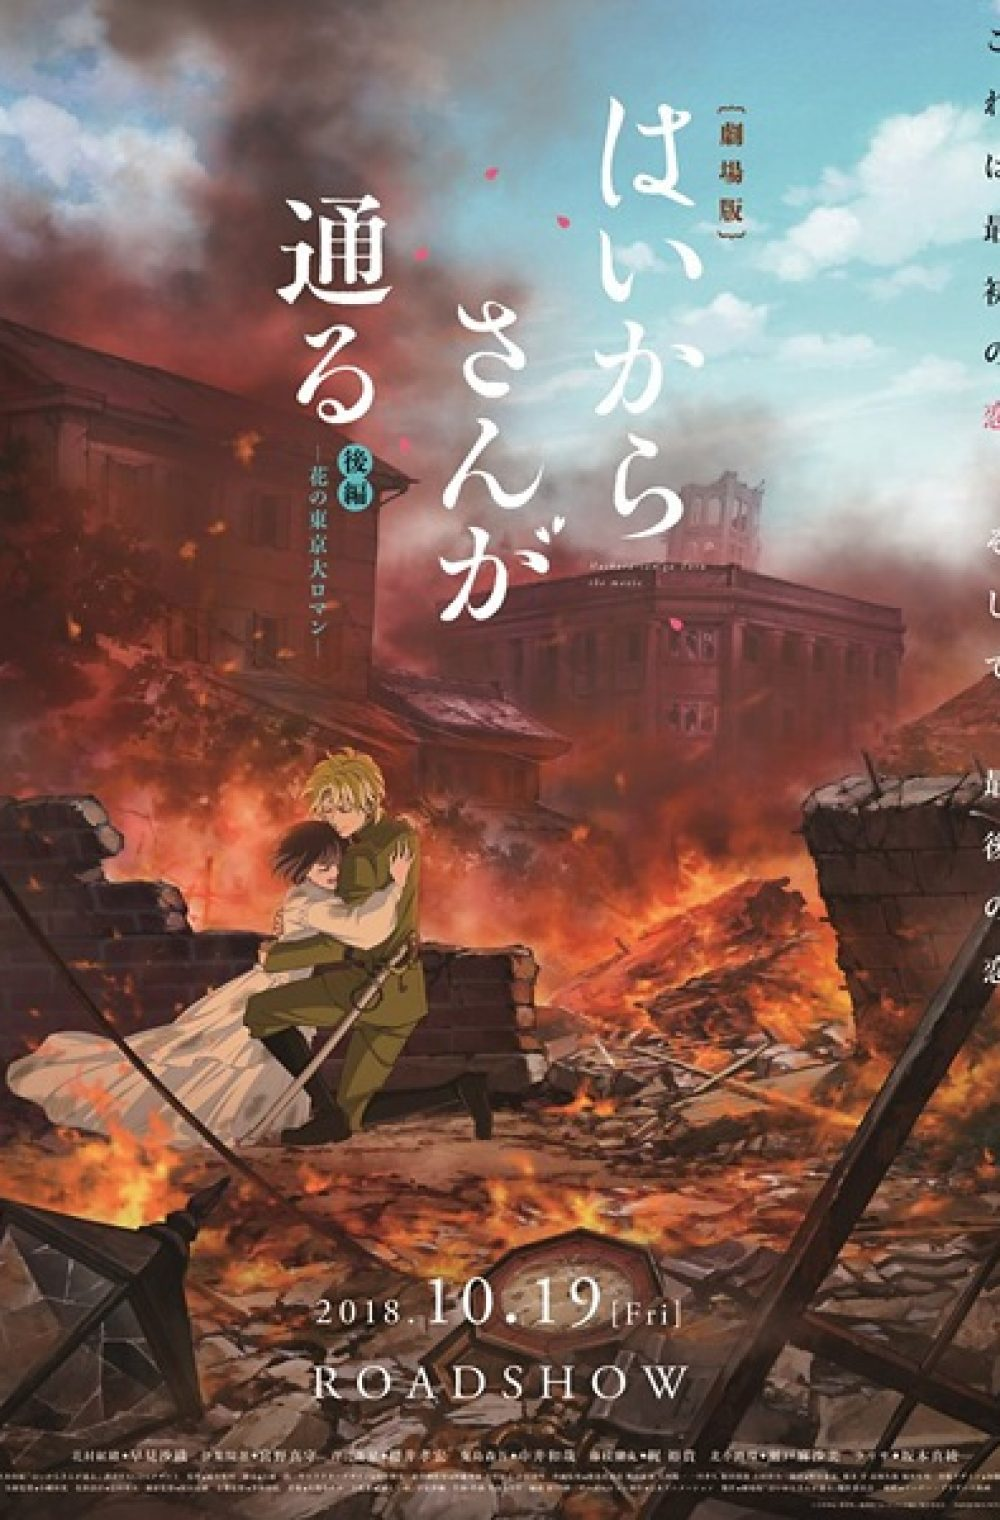 Haikara-san Ga Tooru Movie 2 Streaming : haikara-san, tooru, movie, streaming, Haikara-san, Tooru, Movie, Tokyo, Roman, English, Subbed, Kawaiifu